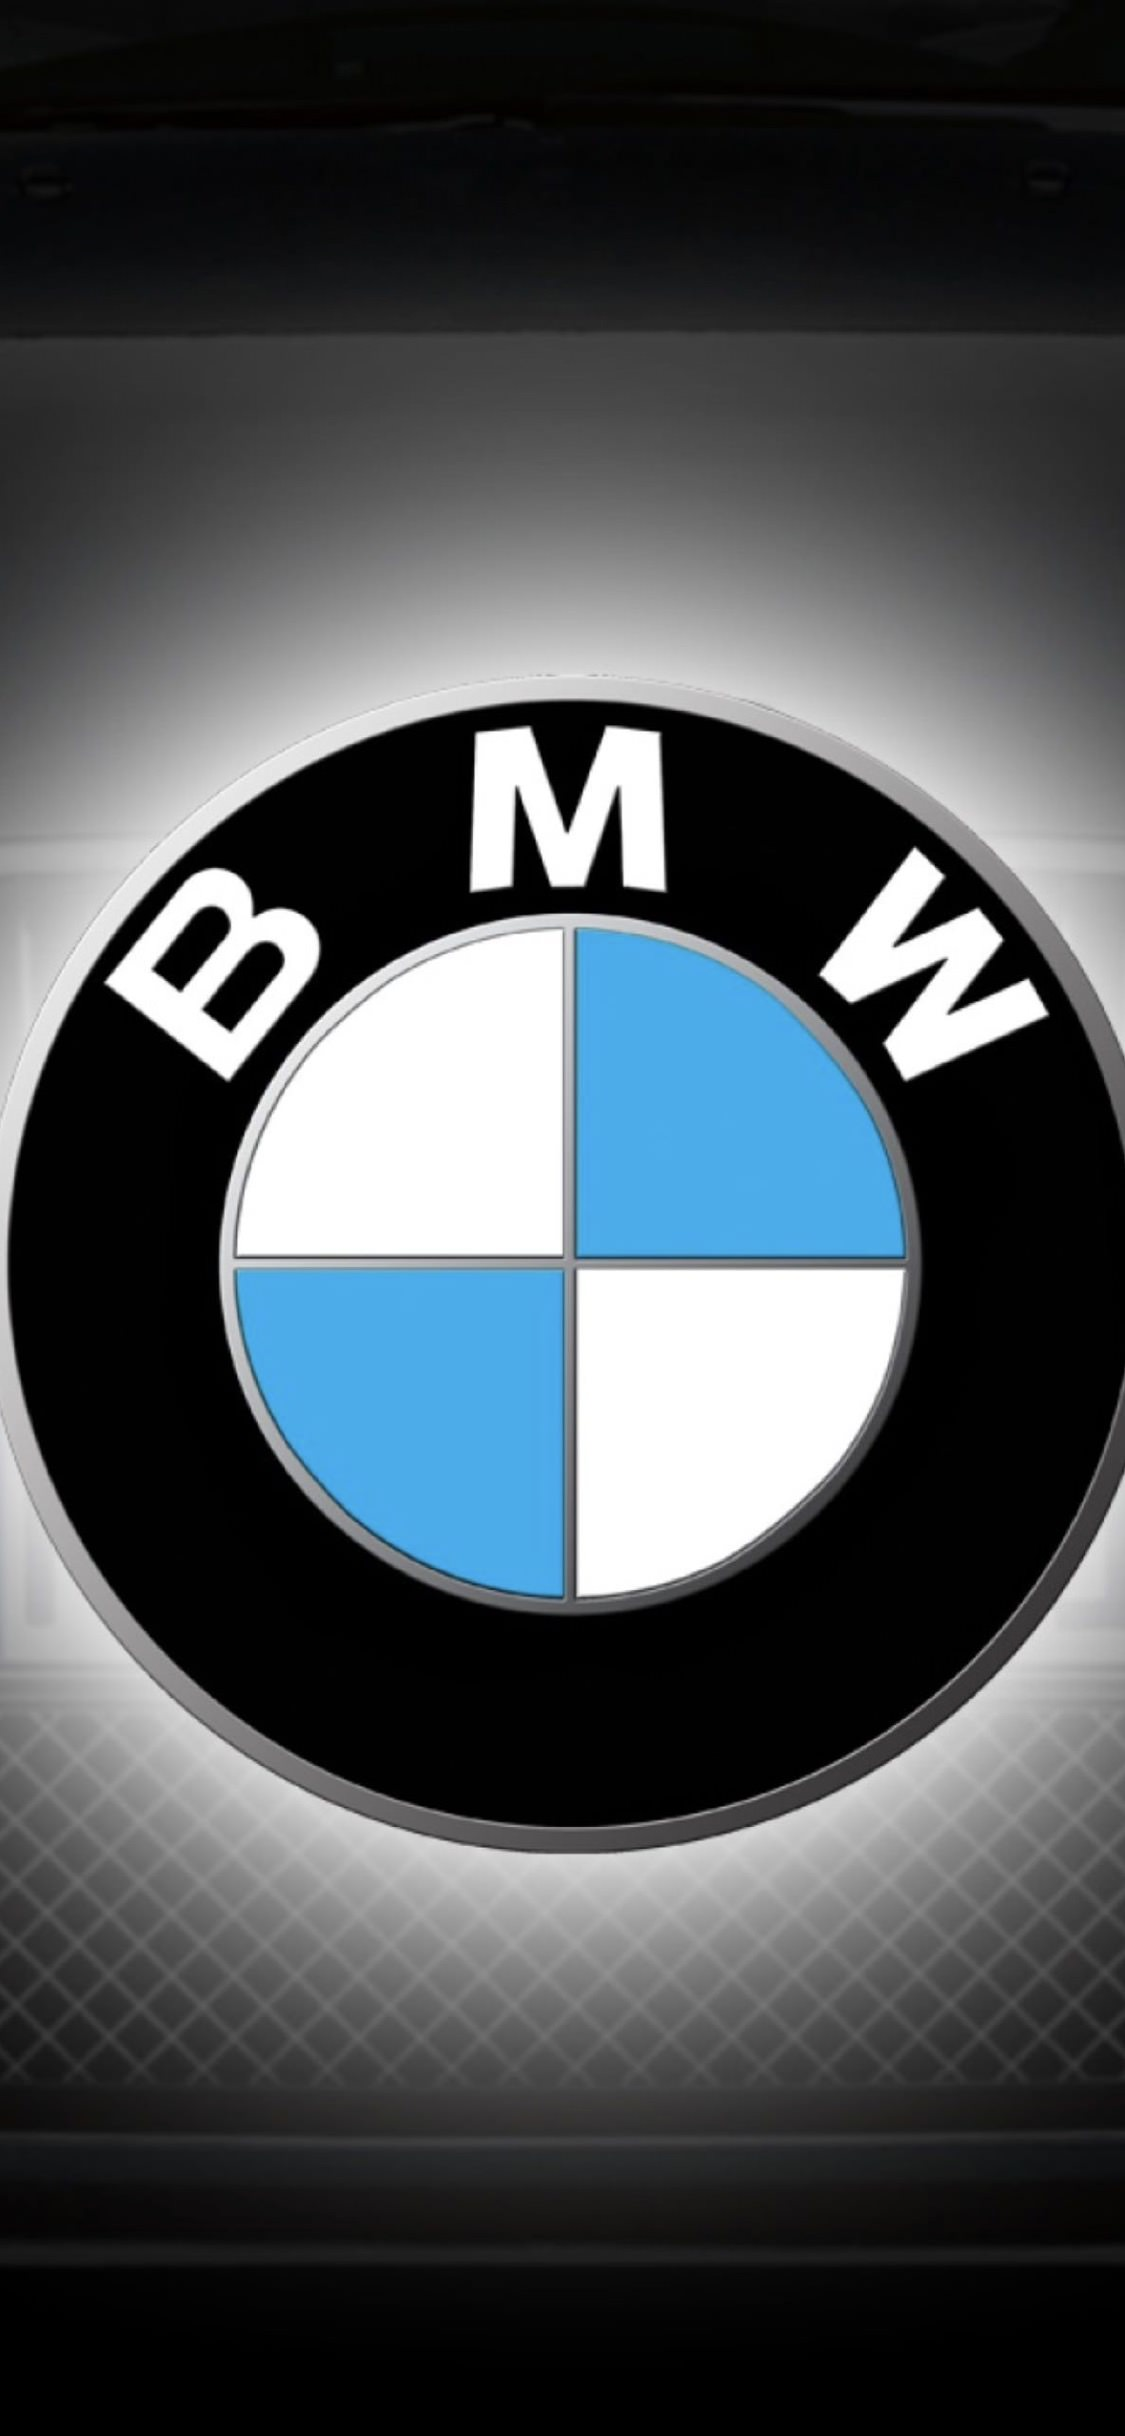 Logotipo De Bmw Wallpapersc Iphonexs